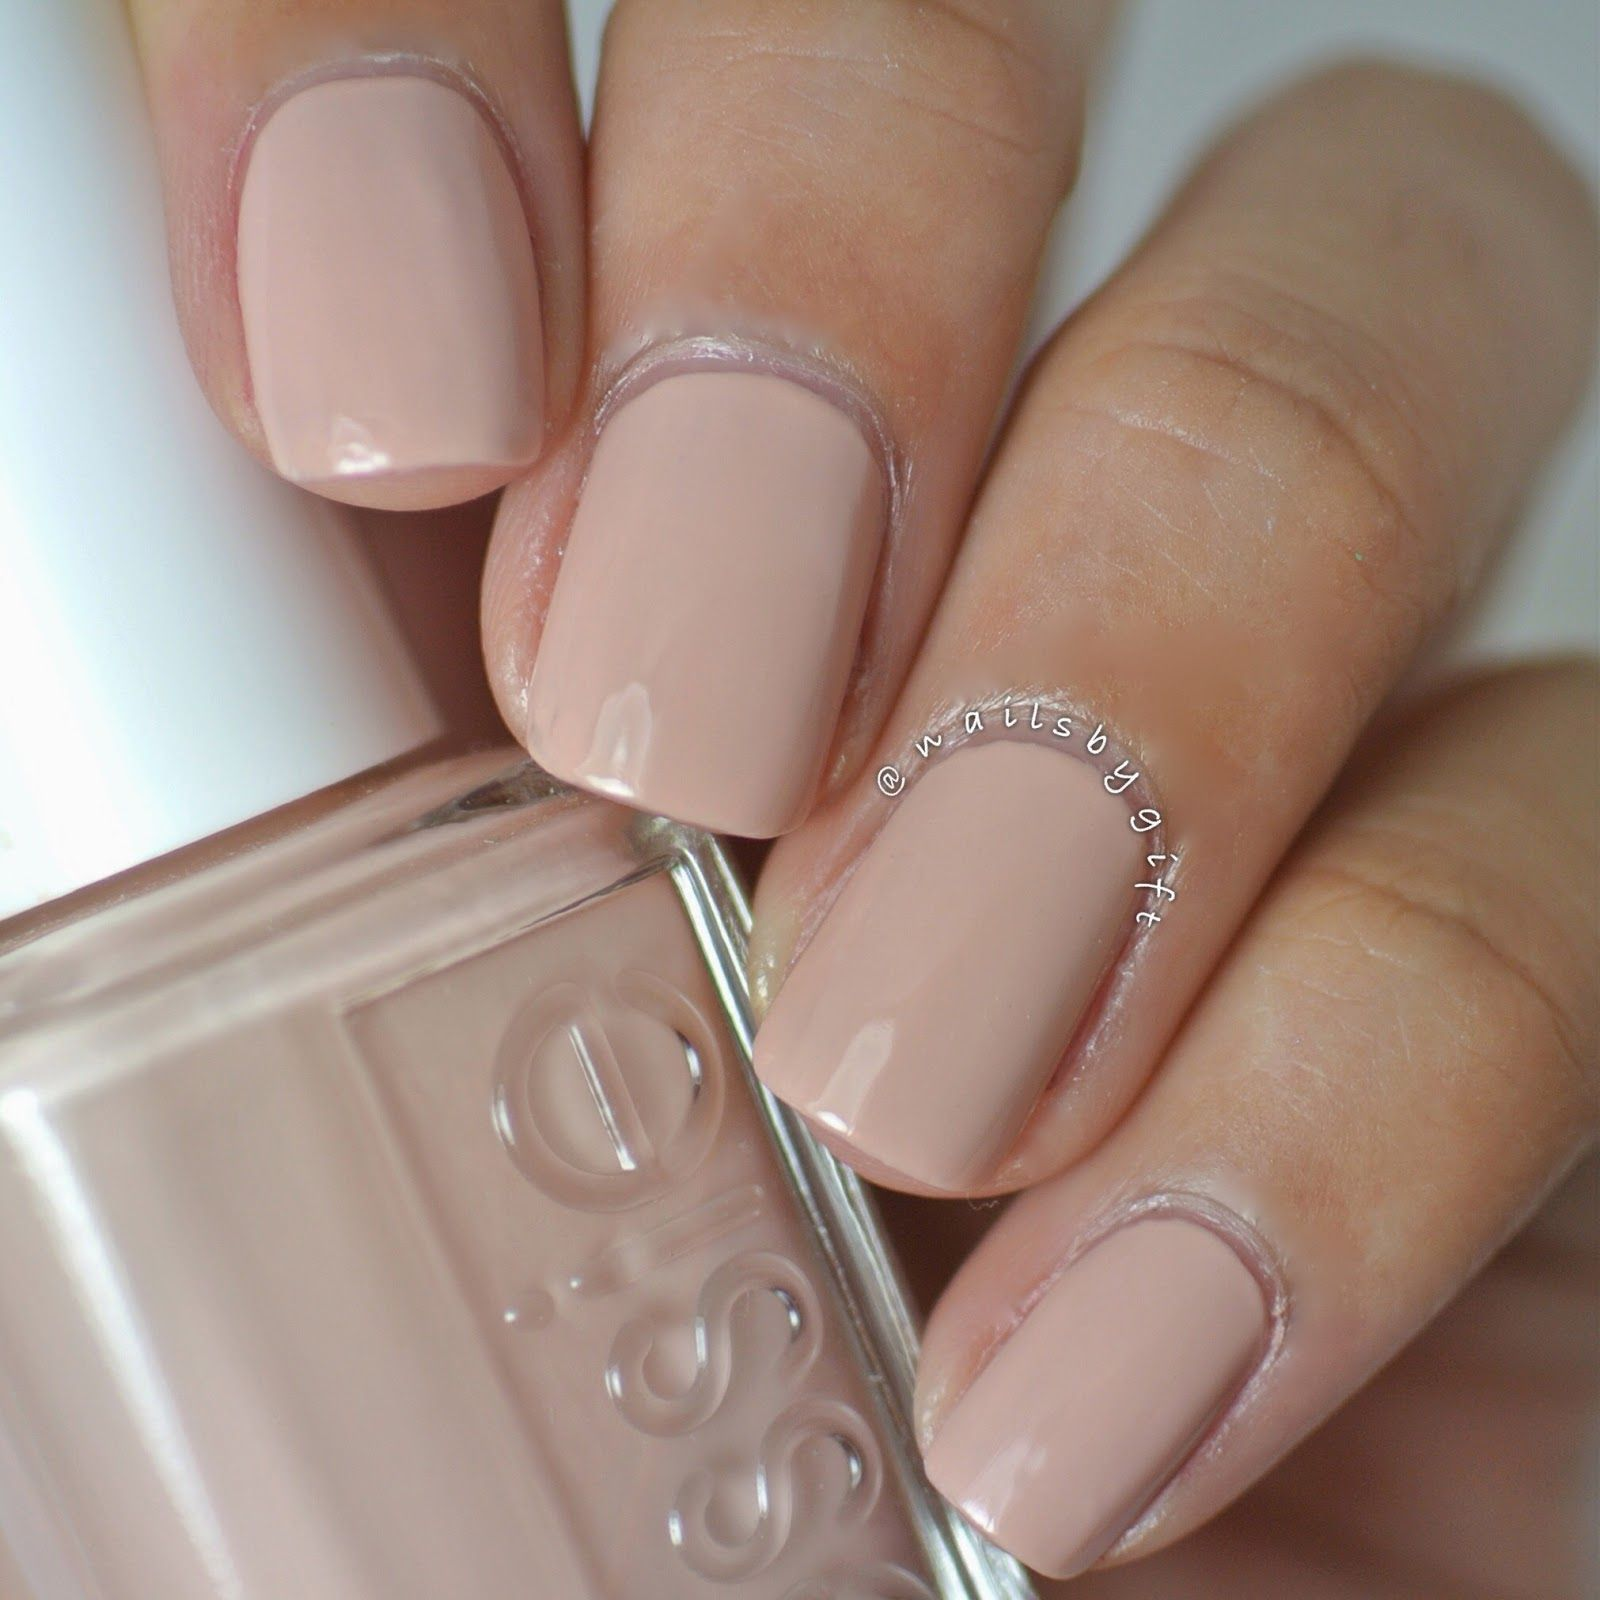 Essie - Jazz   Essie nail polish, Nail polish, Nail colors